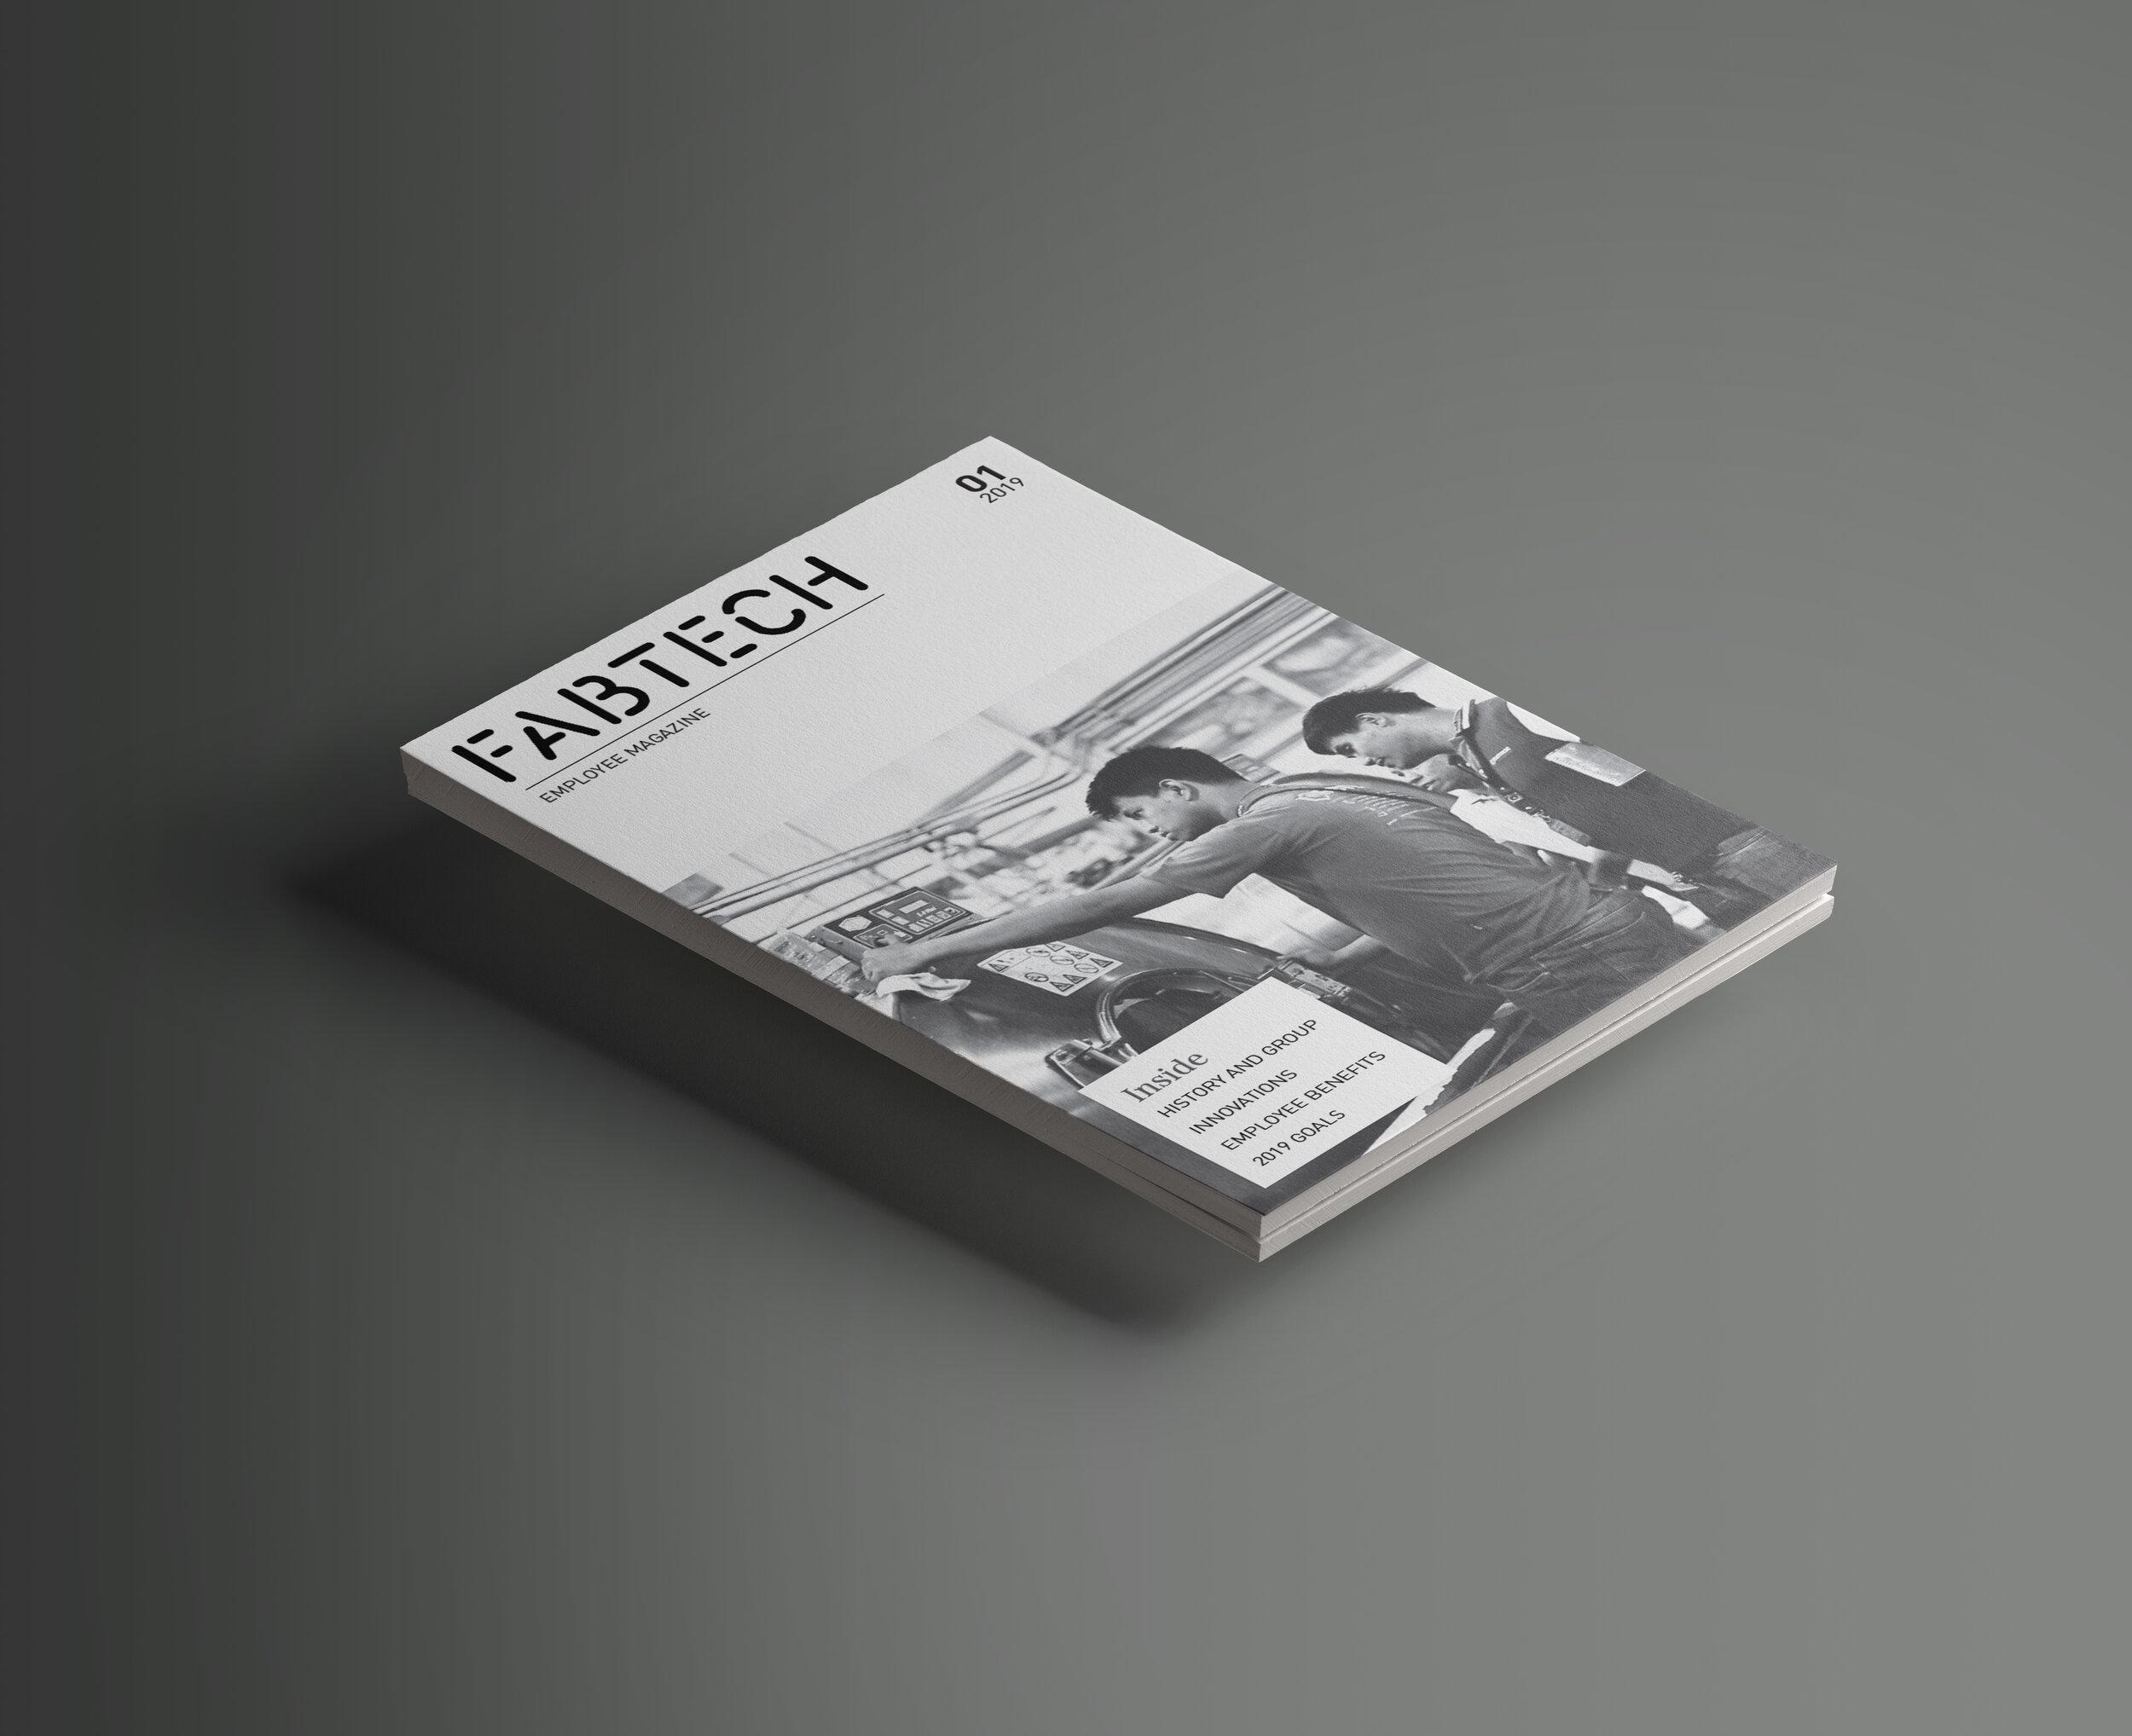 Paper-Brand-Isometric-Presentation-Mockup.jpg